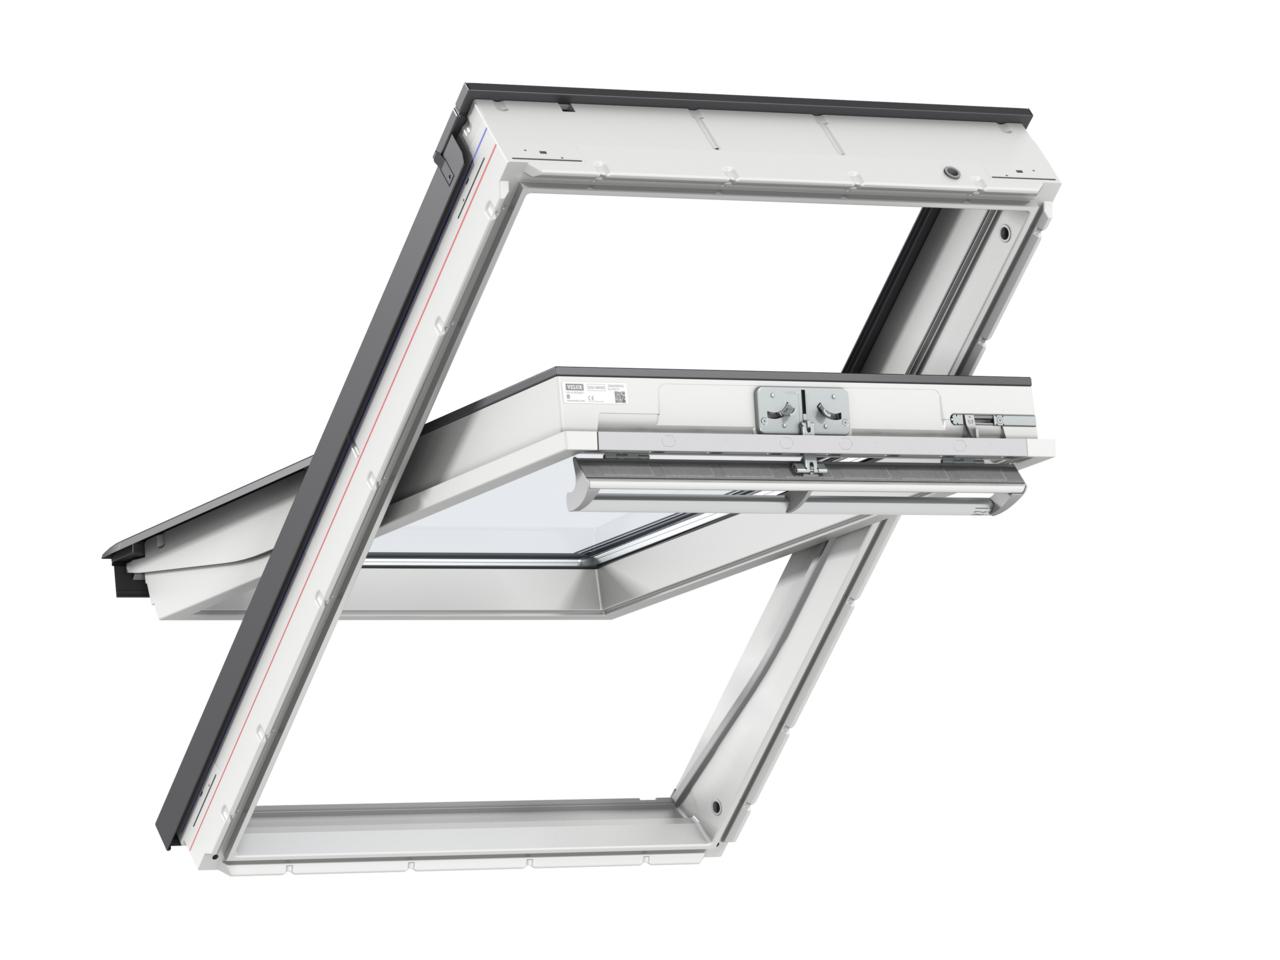 Velux GGU FK06 660 x 1180mm Centre Pivot 34Pane Roof Window - White Polyurethane